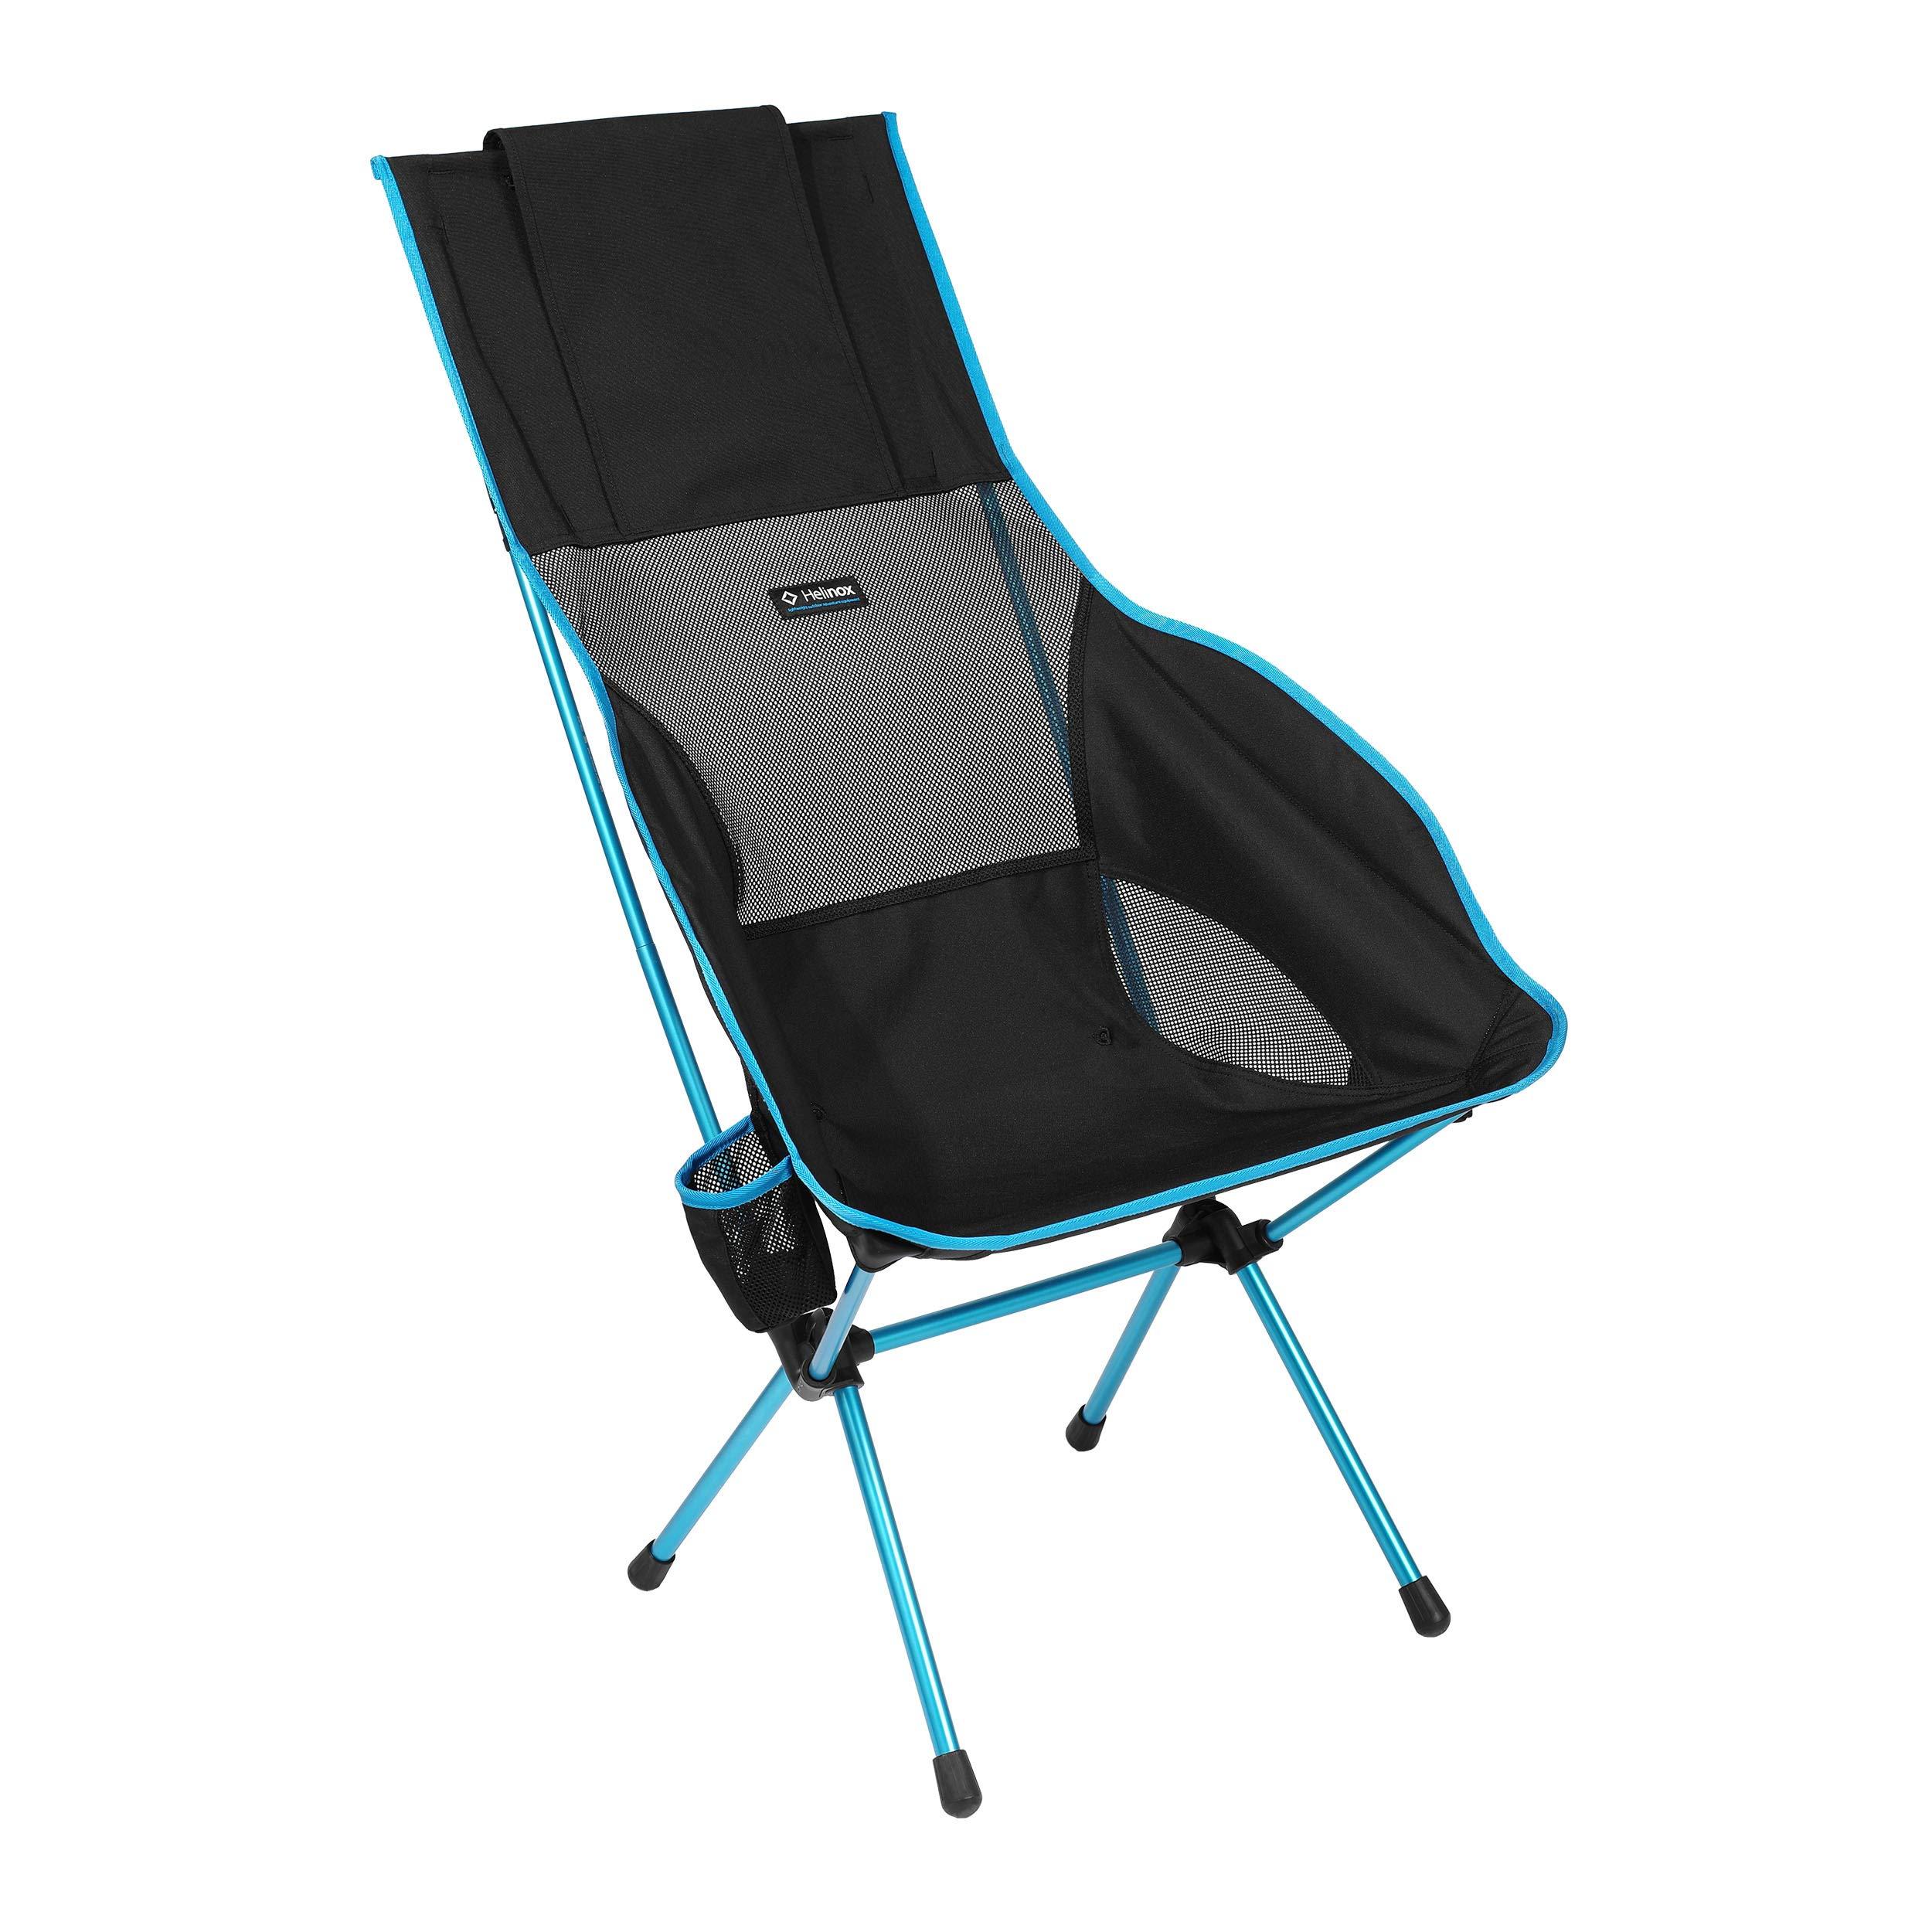 Helinox Savanna High-Back Collapsible Camp Chair, Black